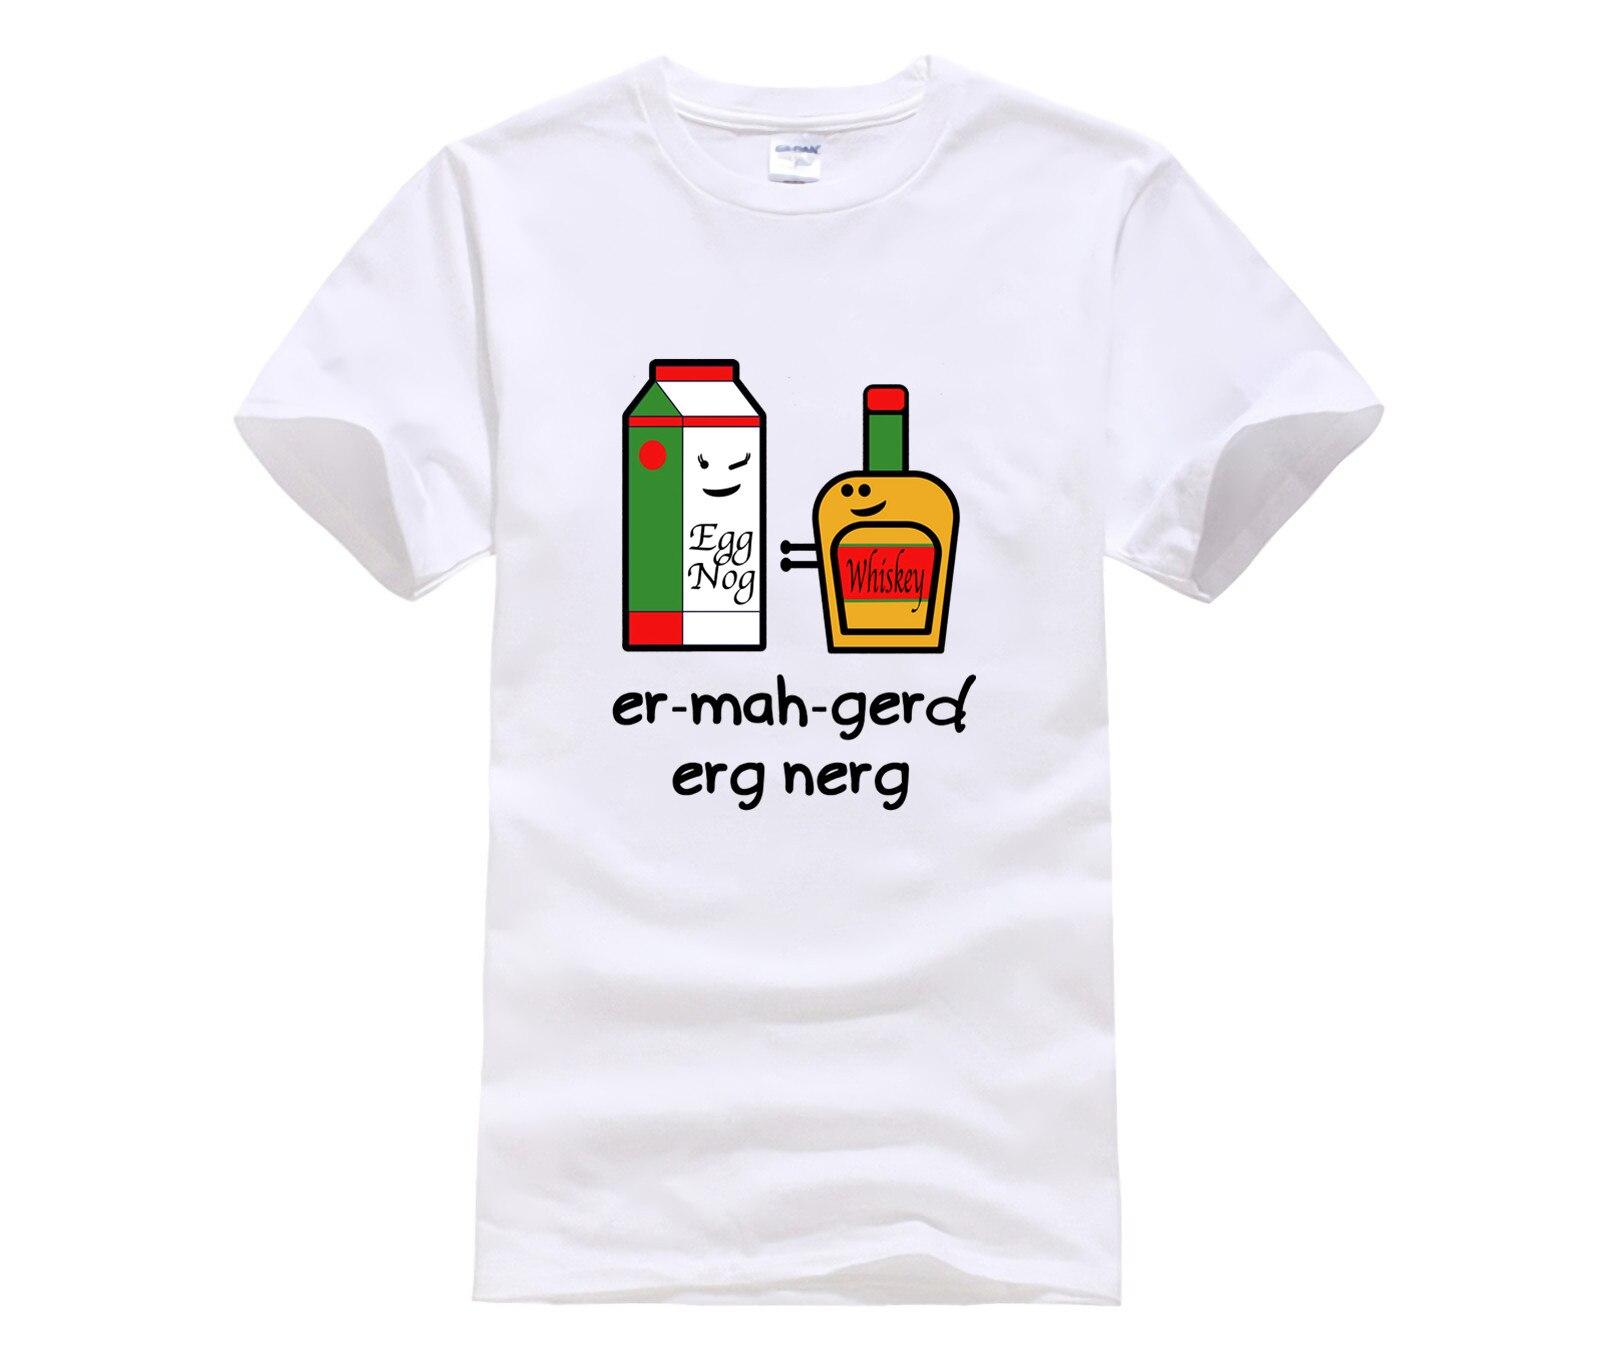 La moda más caliente camiseta impresa en el mundo er mah gerd erg nerg